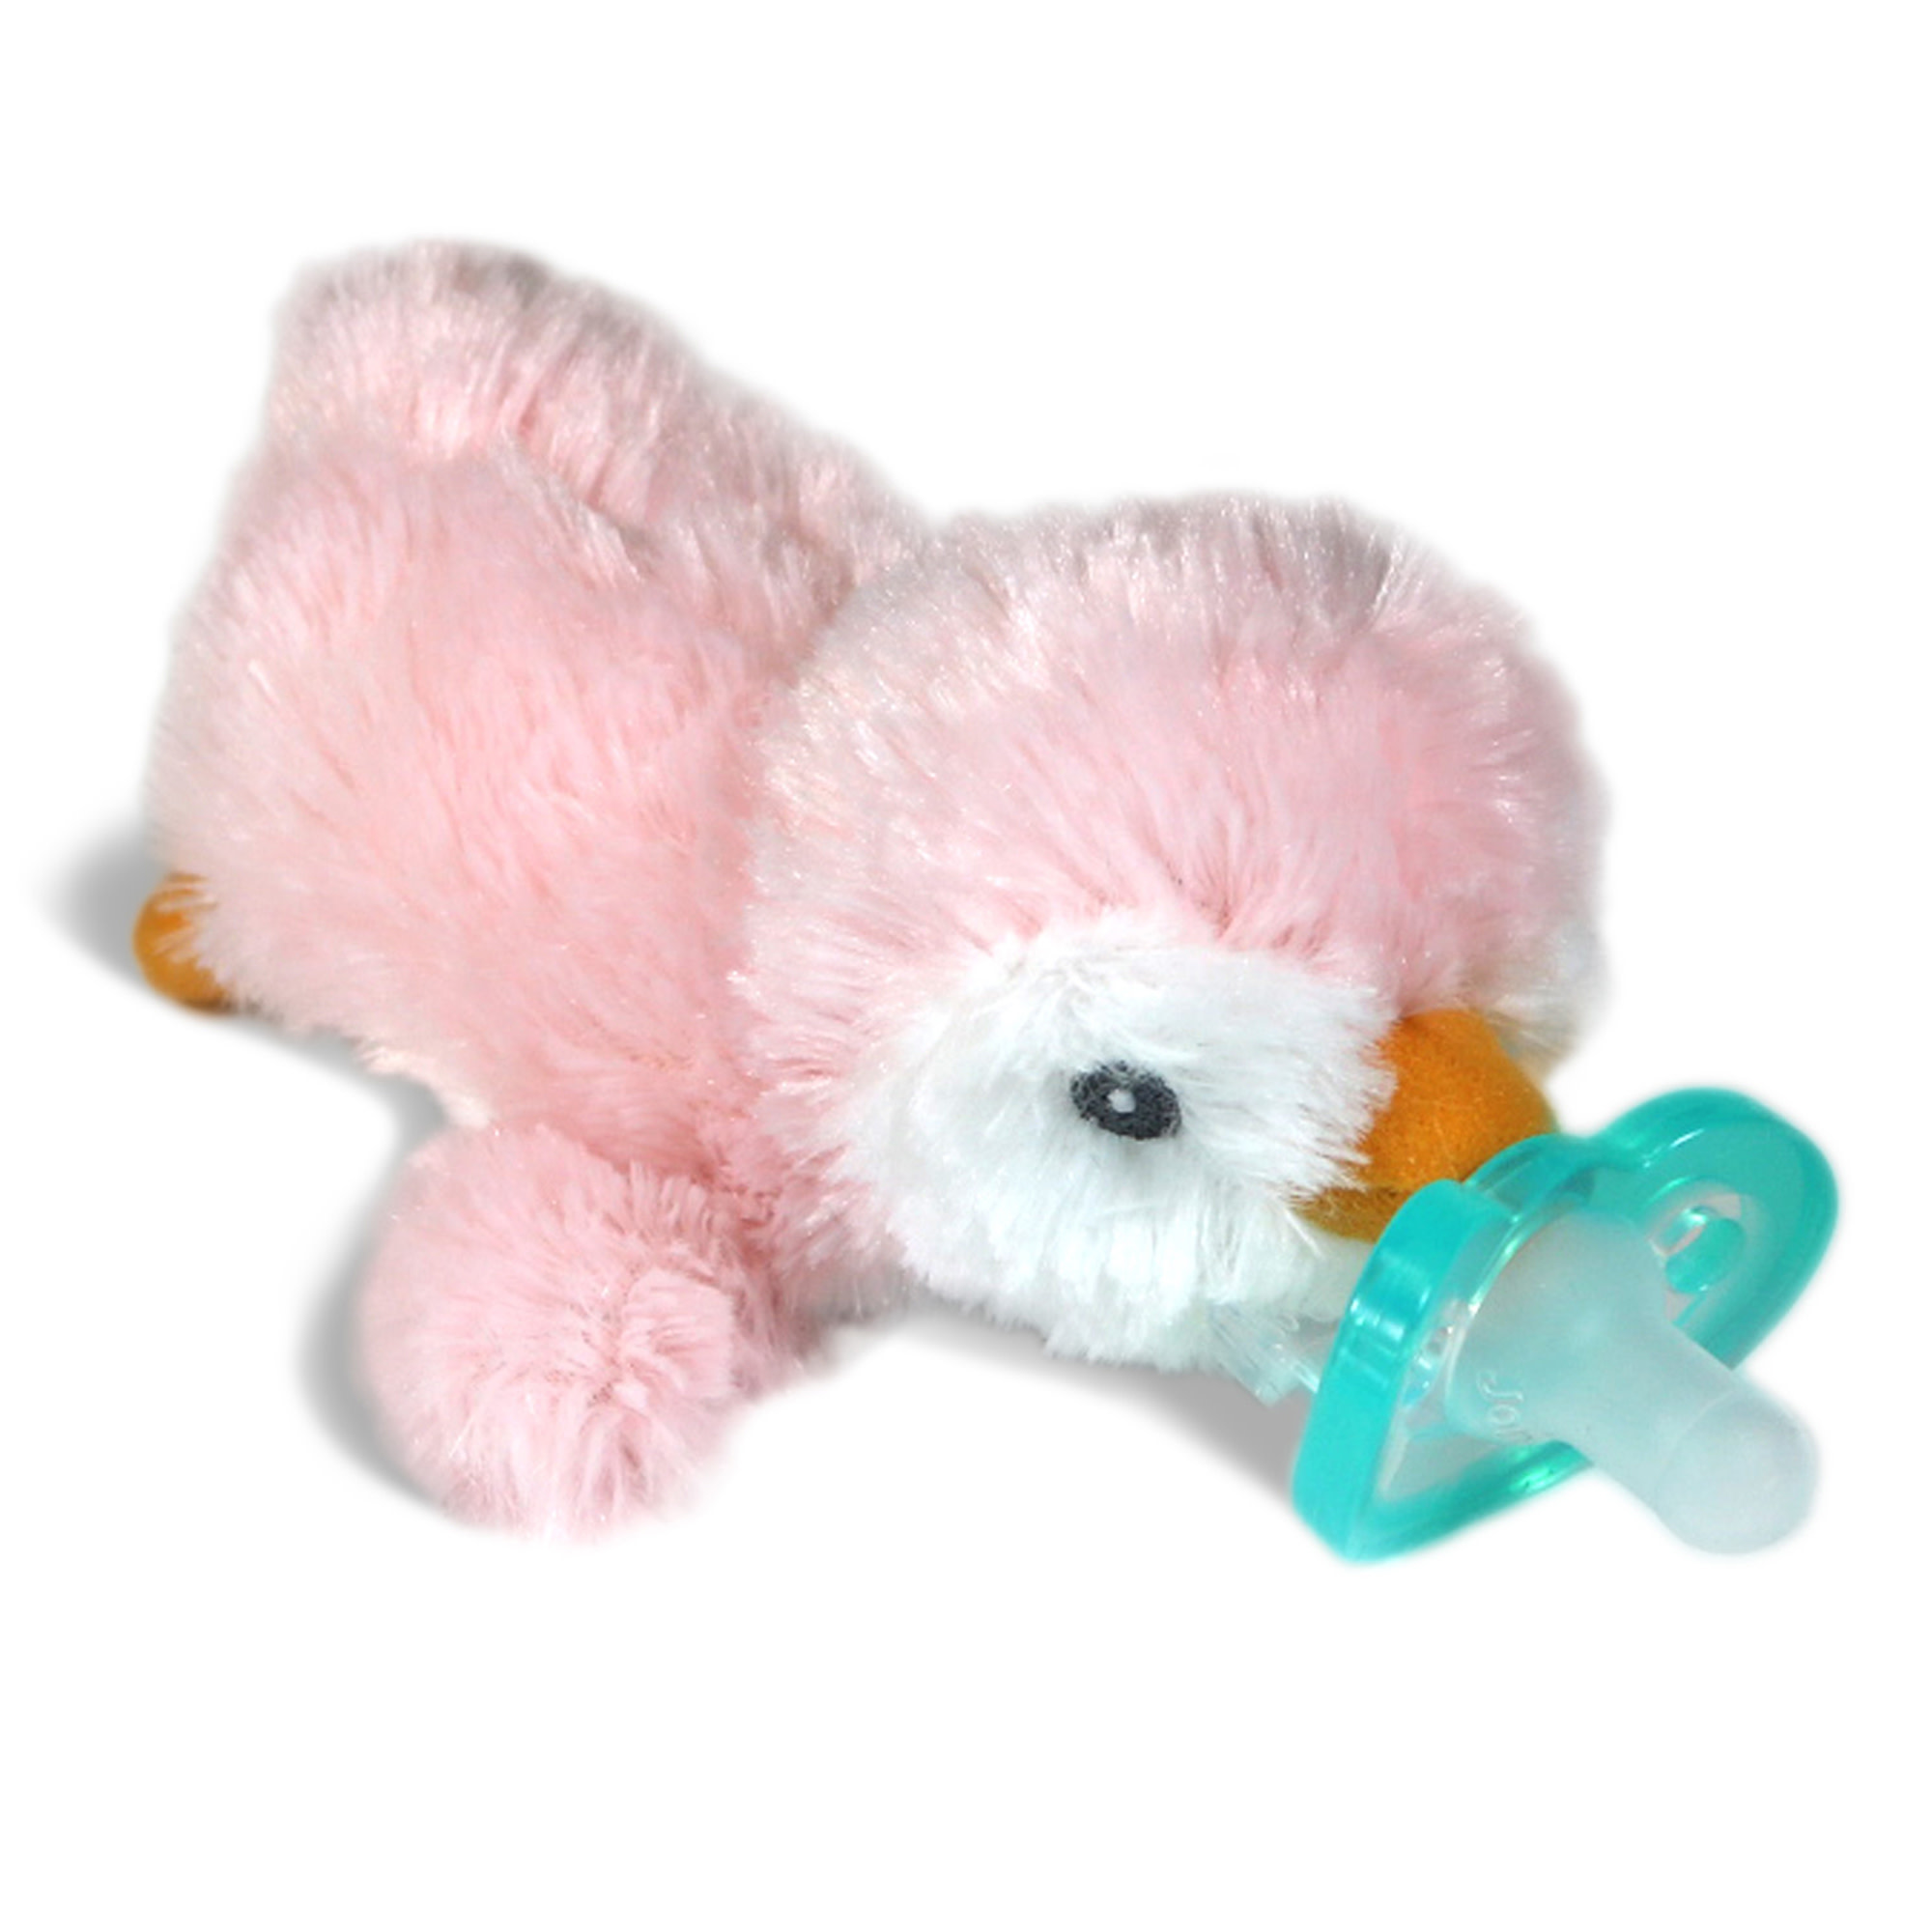 Razbuddy - Pinky le Pingouin-1